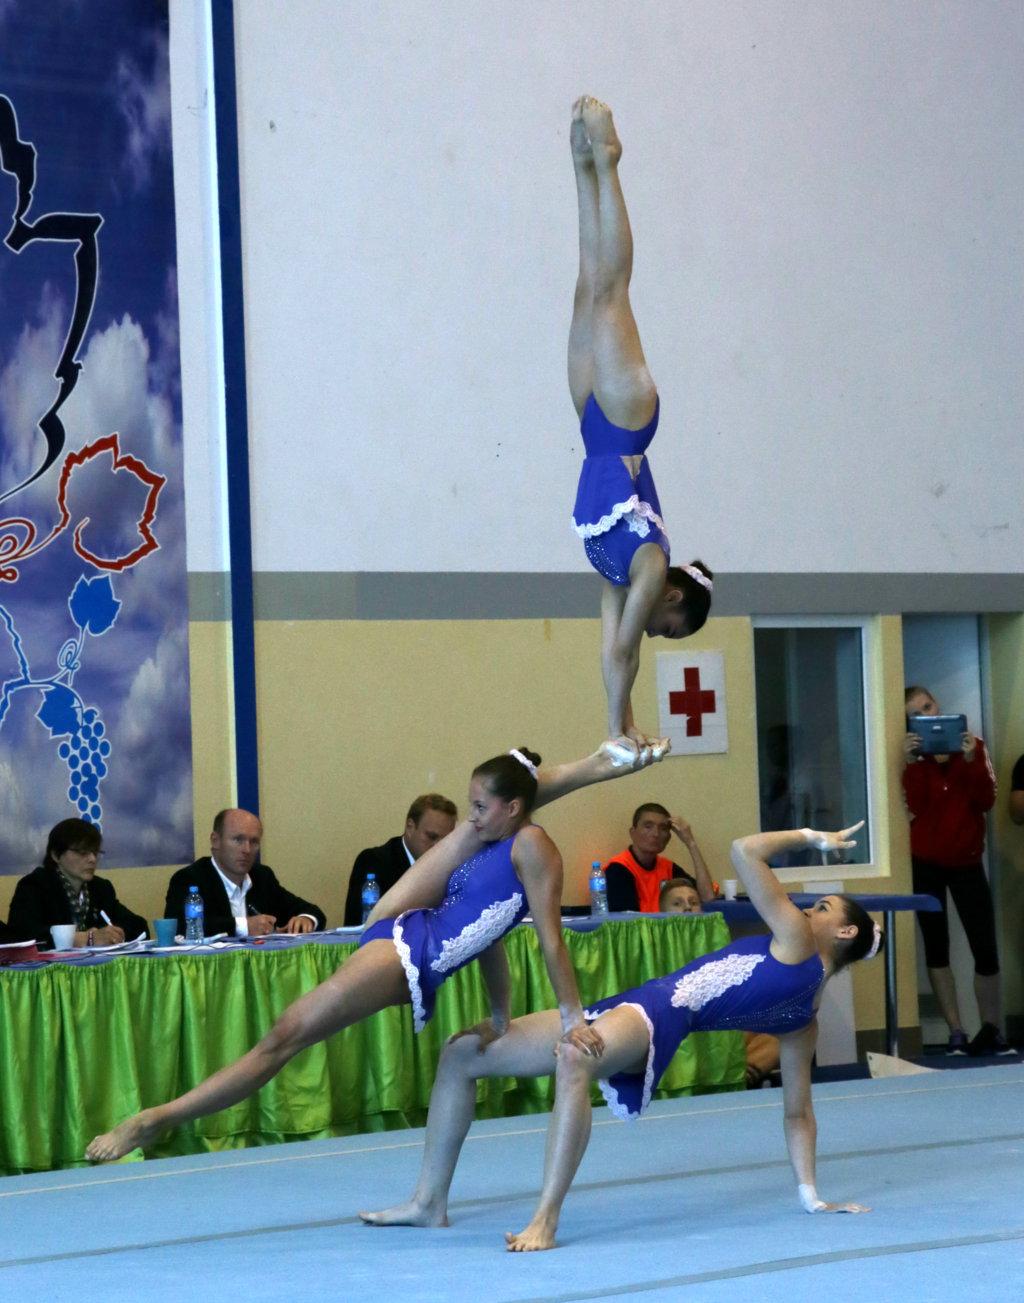 Winobranie – Internationales Turnier Sportakrobatik 2015